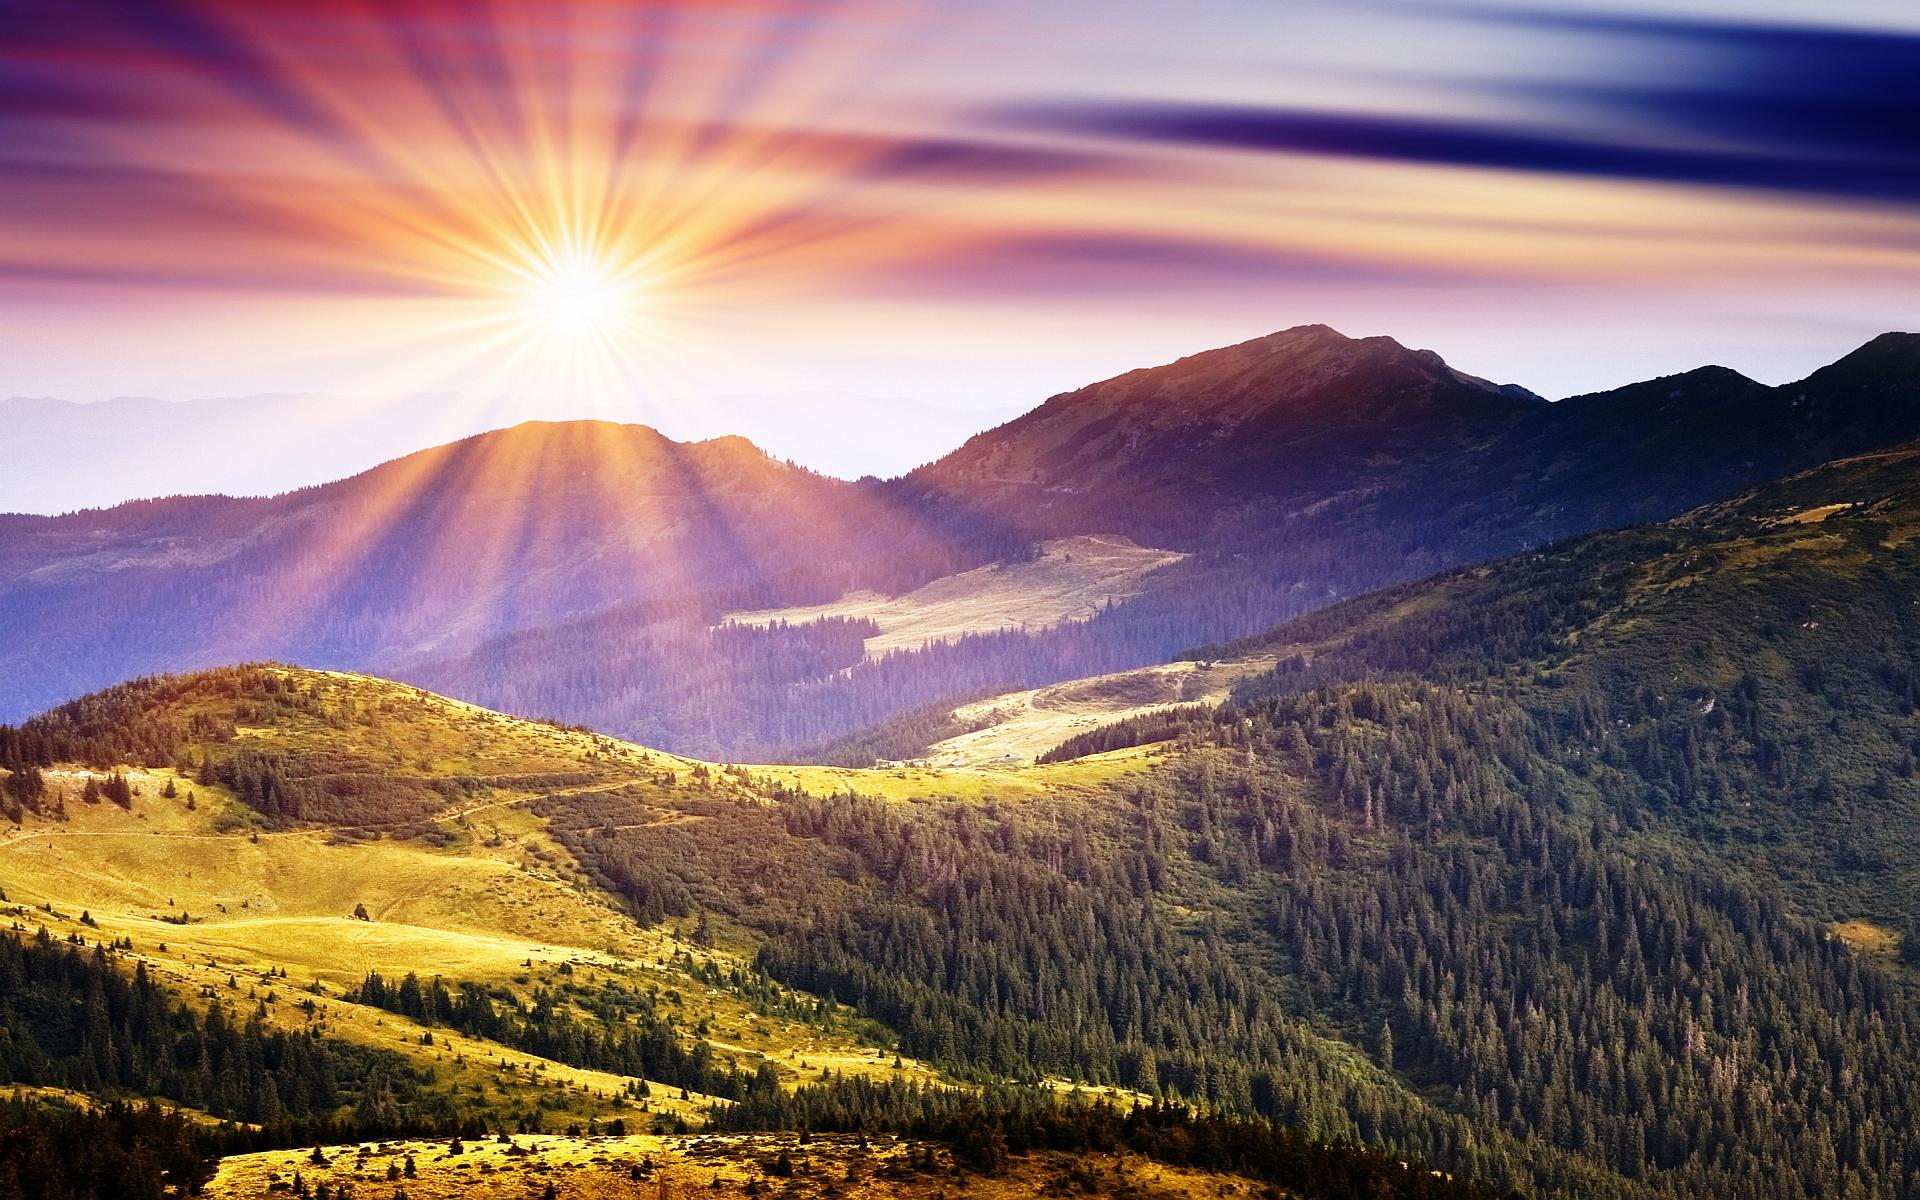 3d Live Wallpaper Free Download For Desktop Sunshine Wallpaper Mountains Hd Desktop Wallpapers 4k Hd